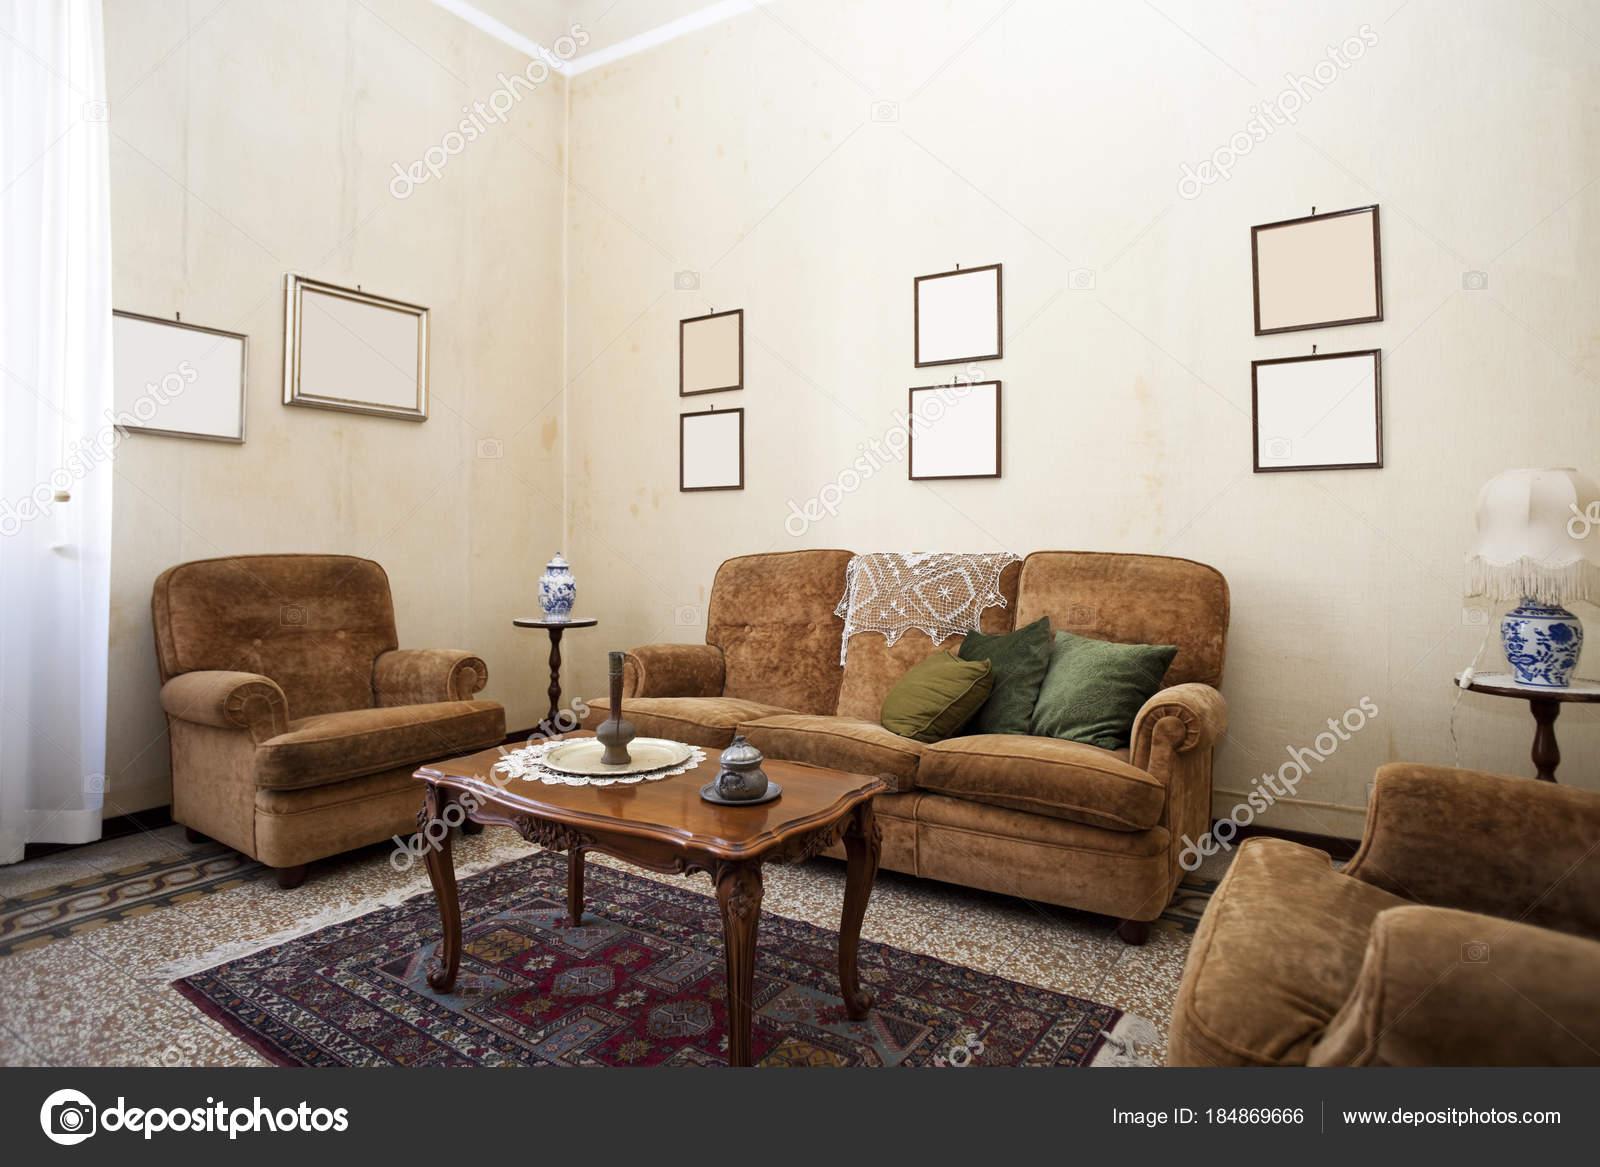 suède Bank woonkamer interieur — Stockfoto © Zveiger #184869666